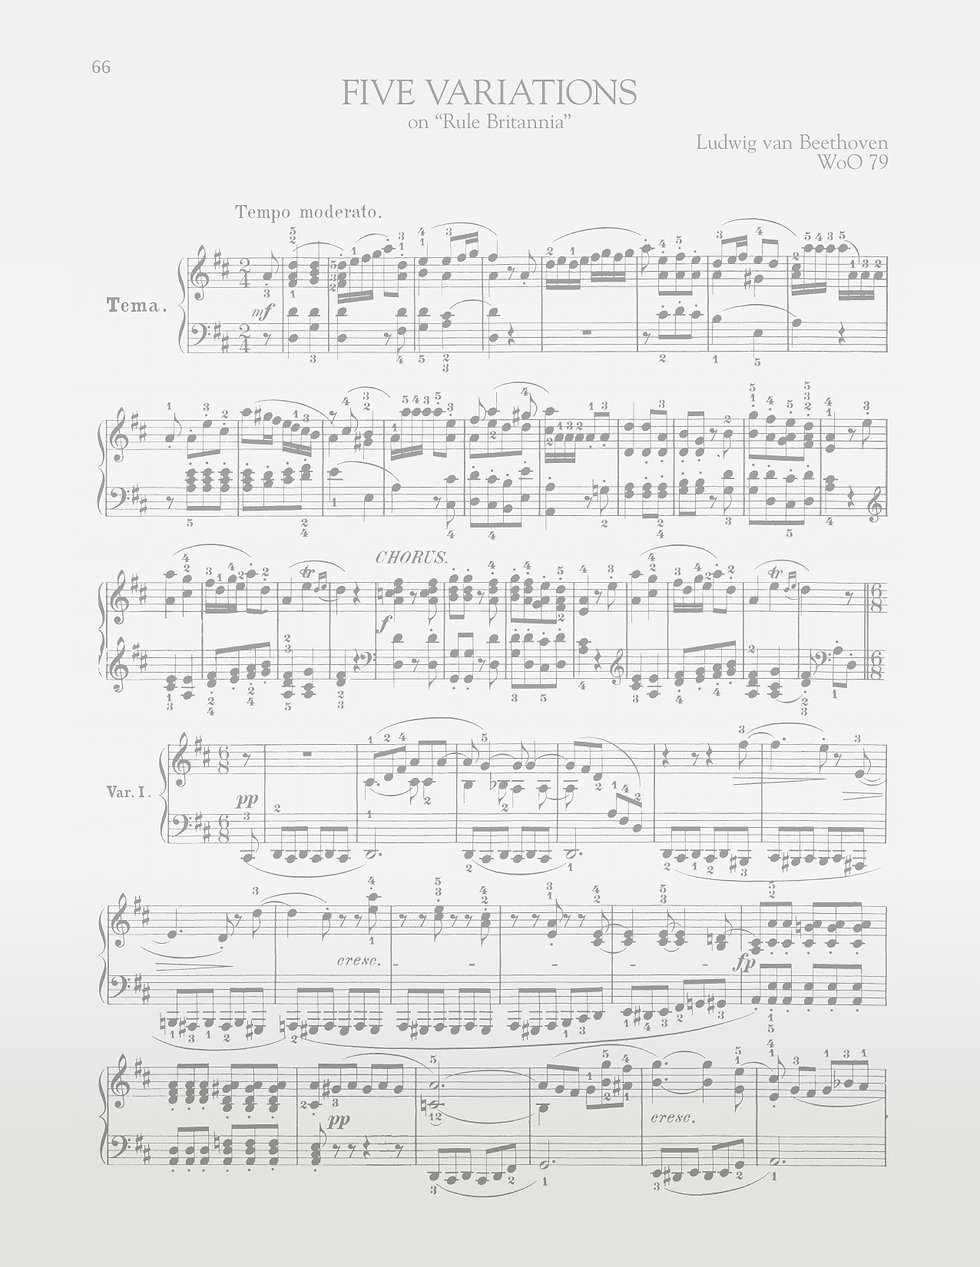 sheet music image_edited.jpg